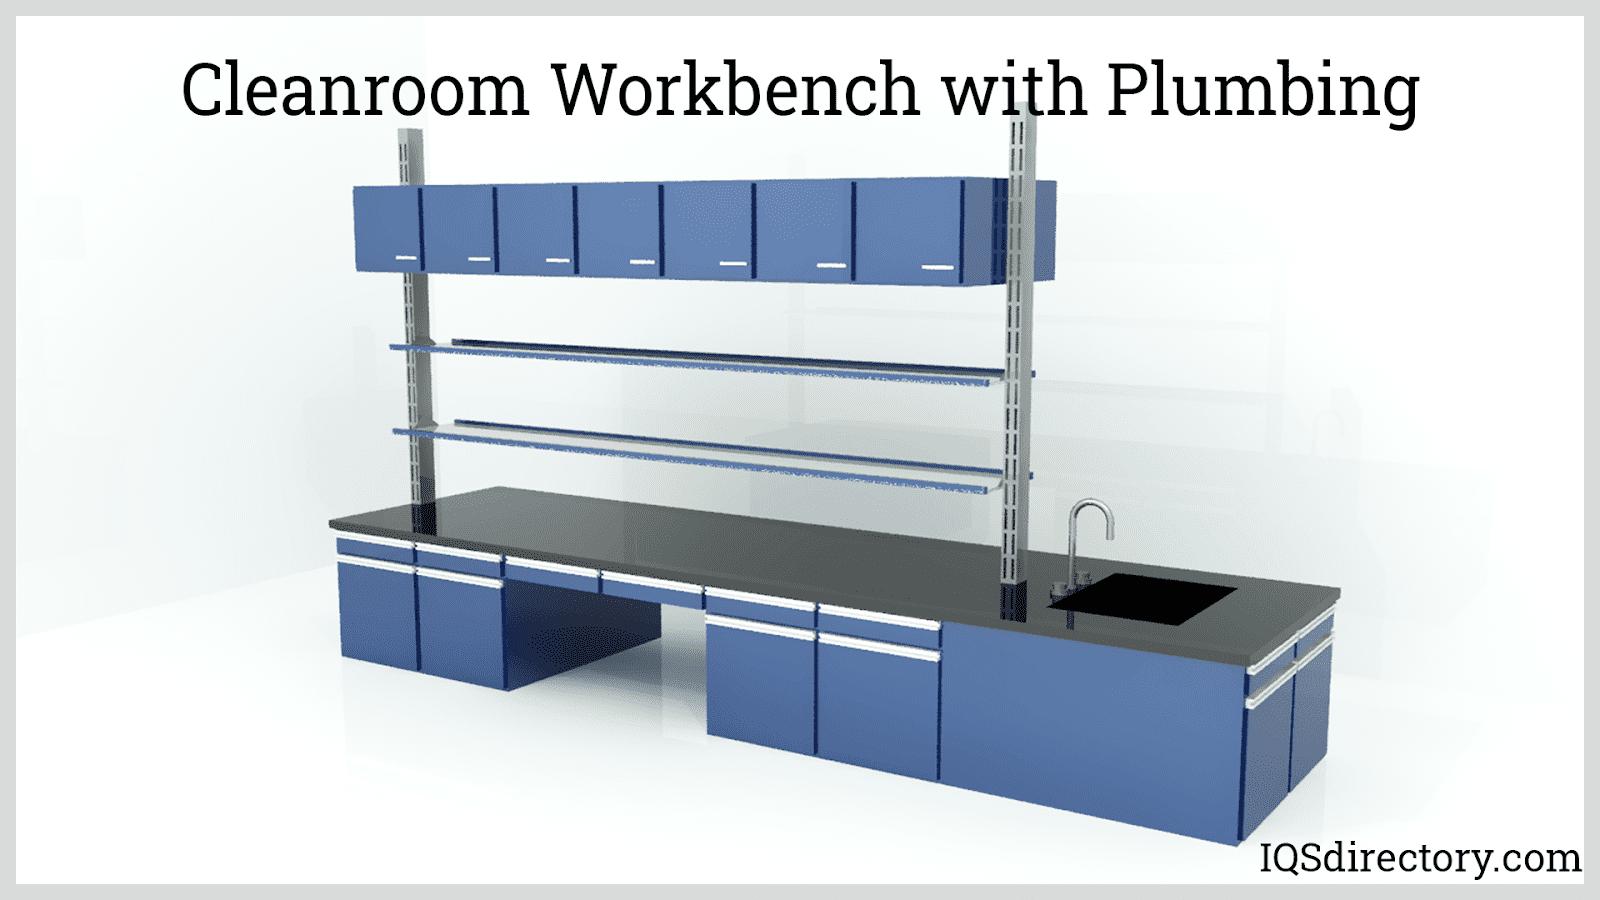 Cleanroom Workbench with Plumbing